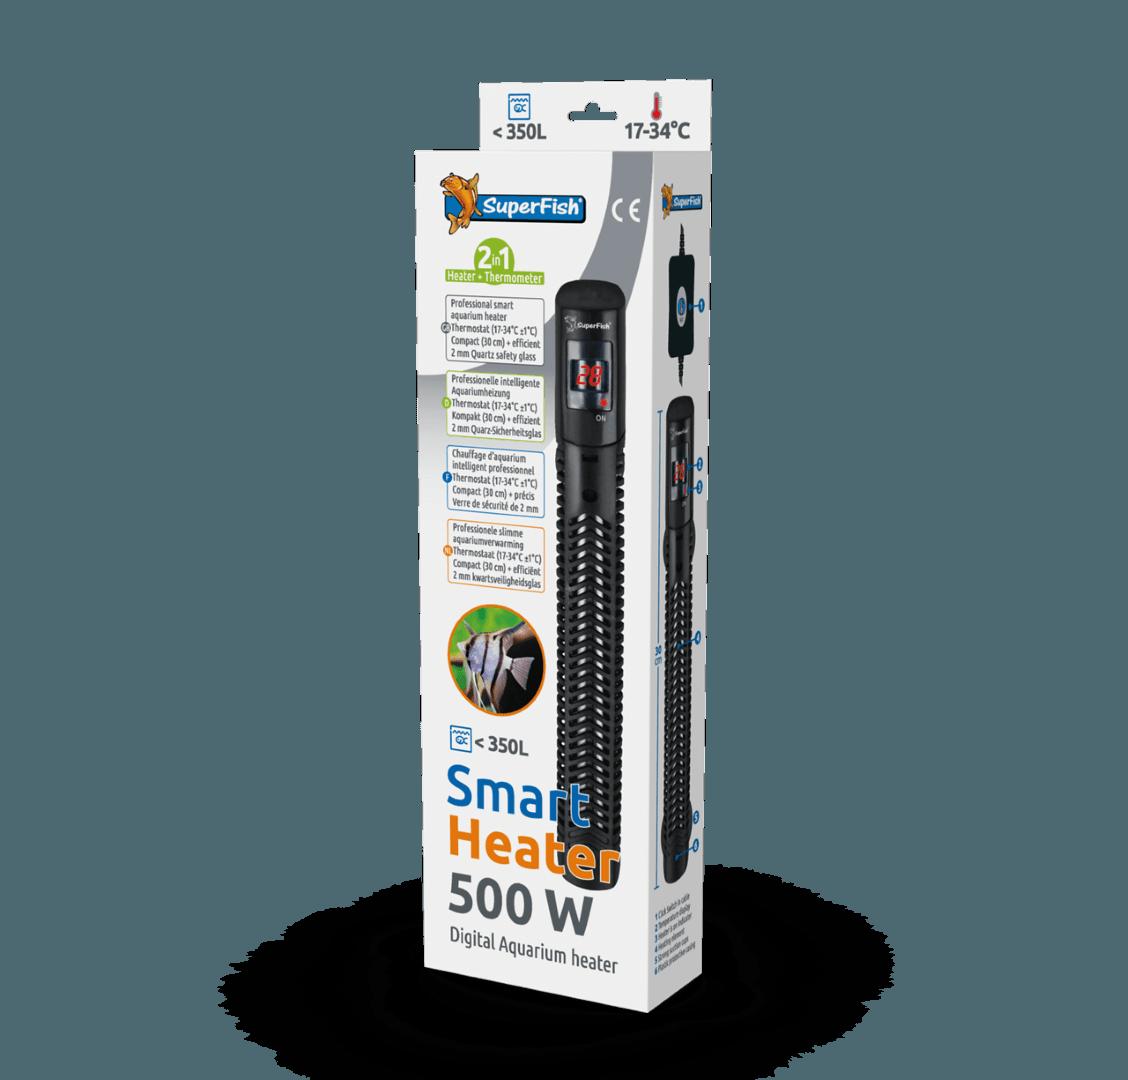 Superfish smart heater 500 watt